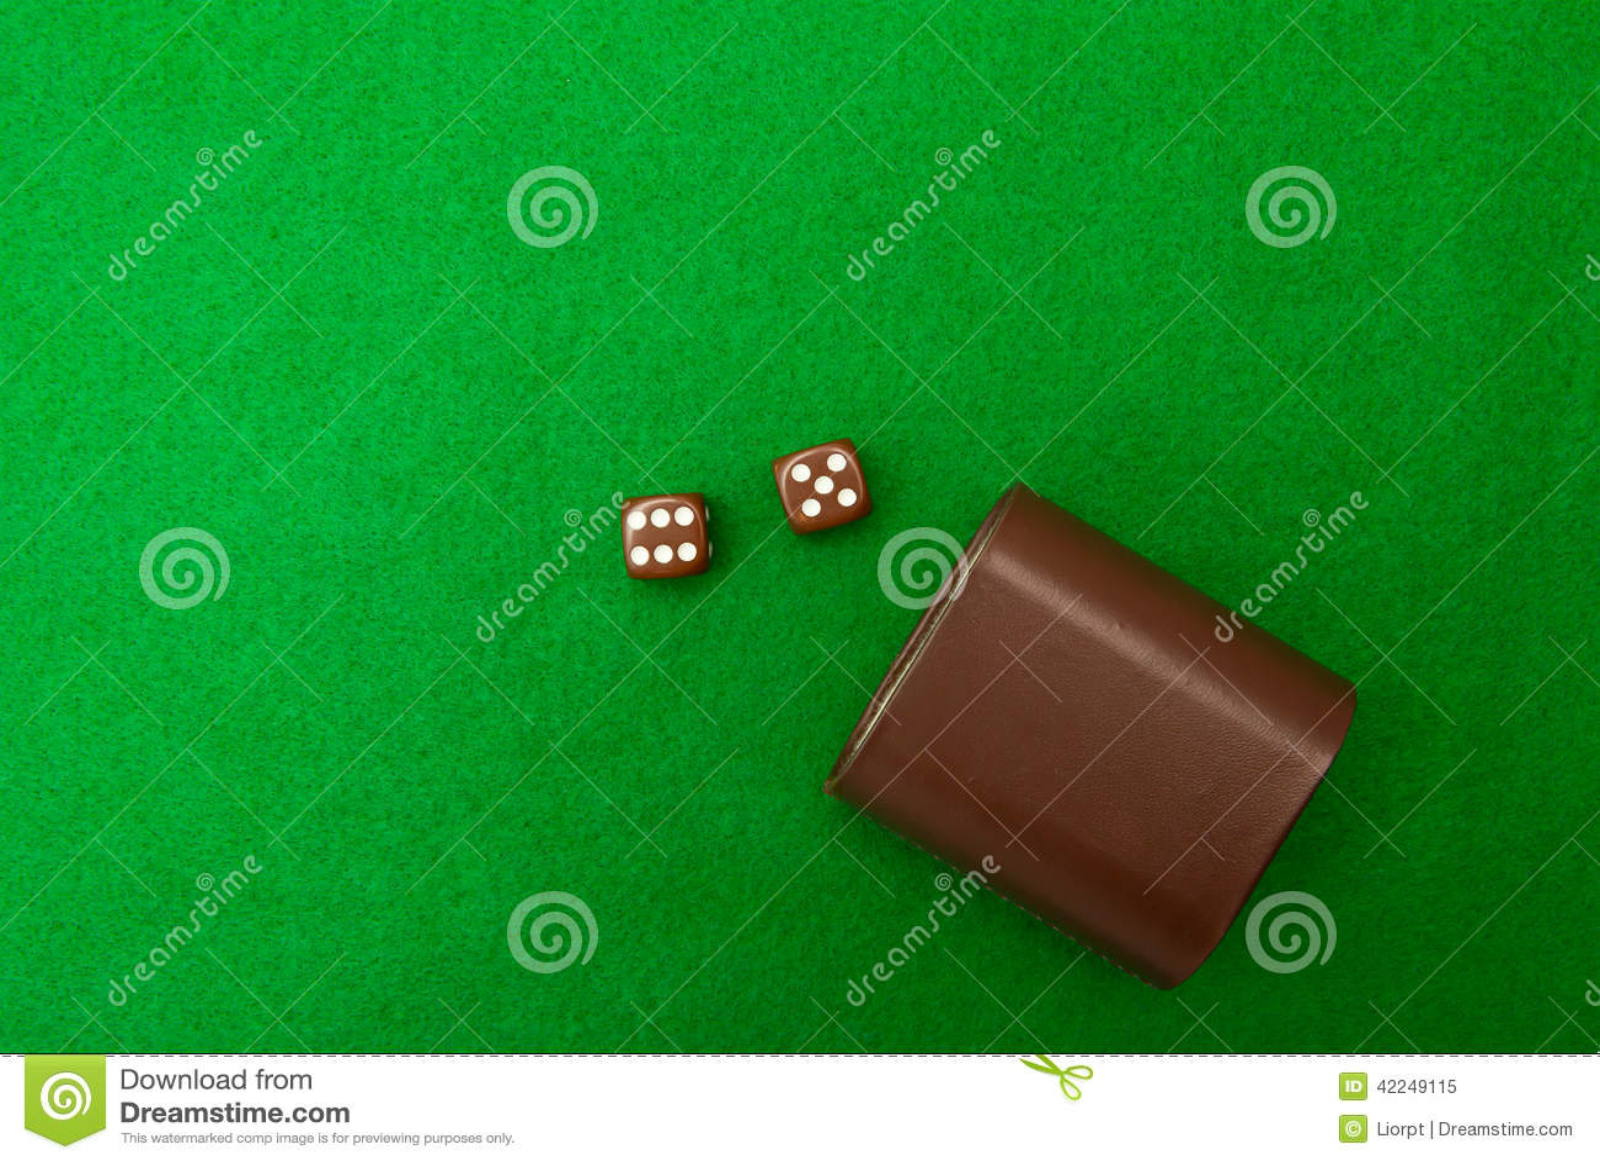 green valley ranch casino wiki